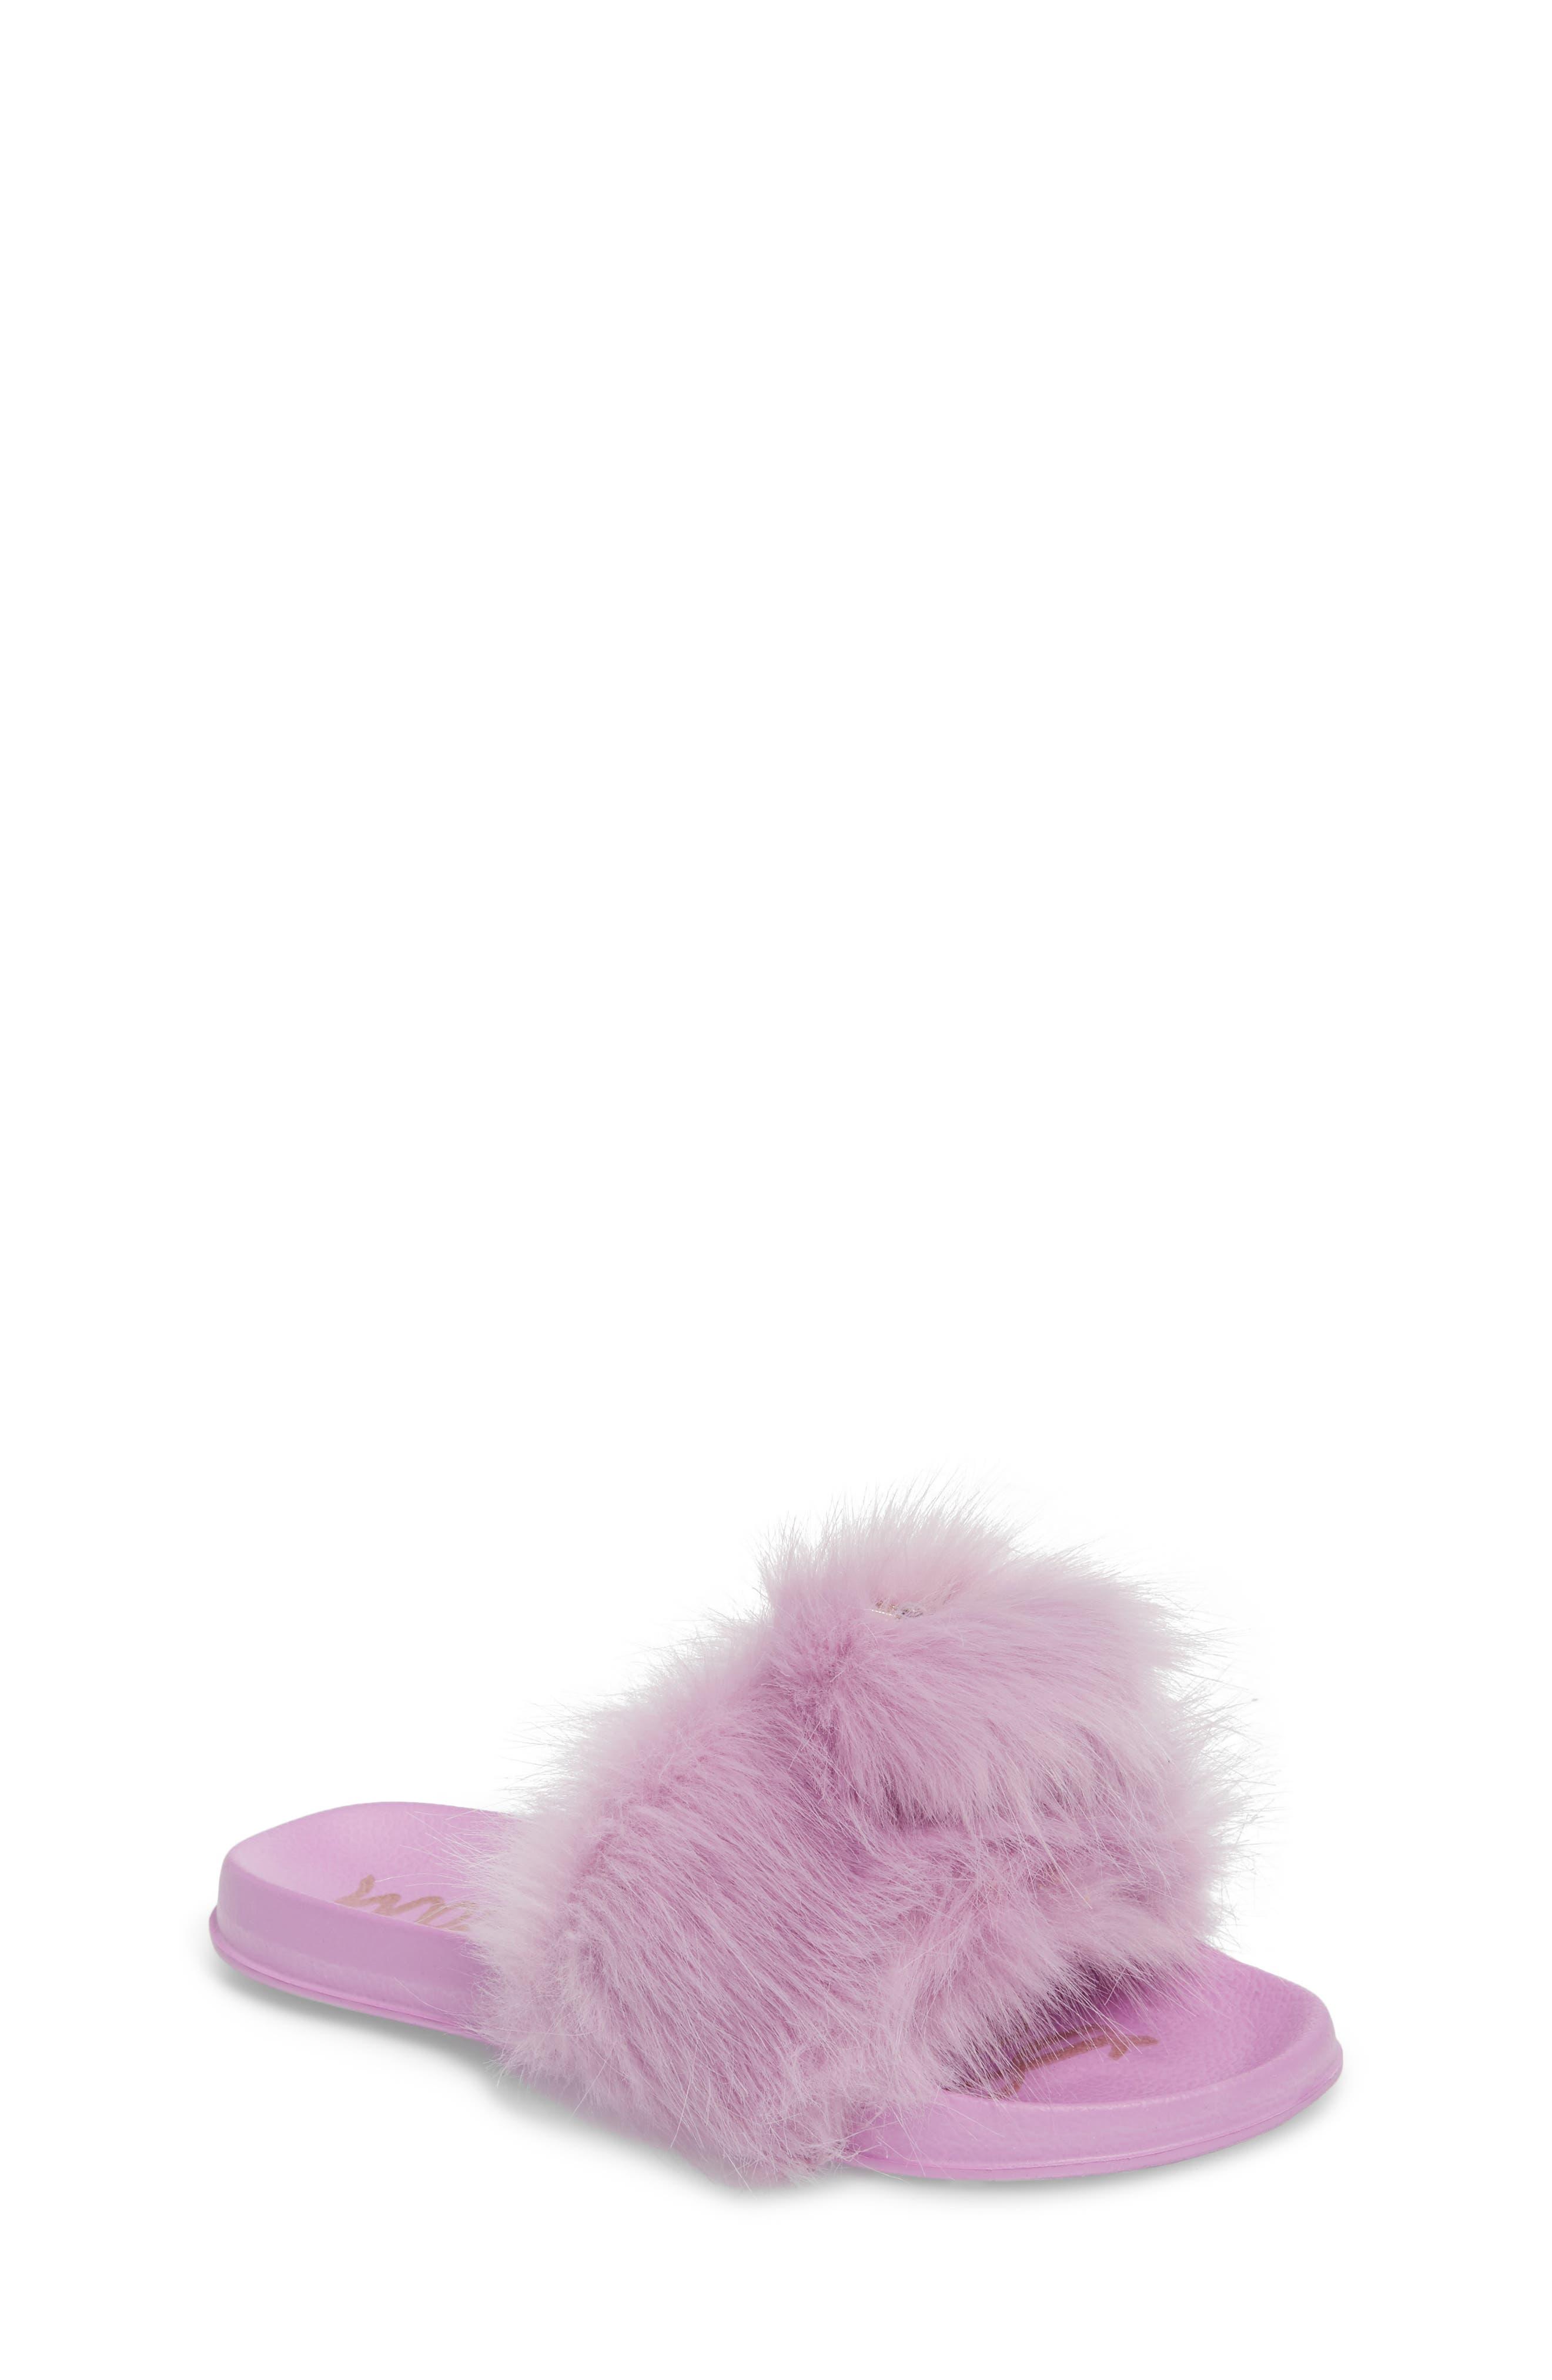 Mackie Aster Faux Fur Slide Sandal,                         Main,                         color, 510